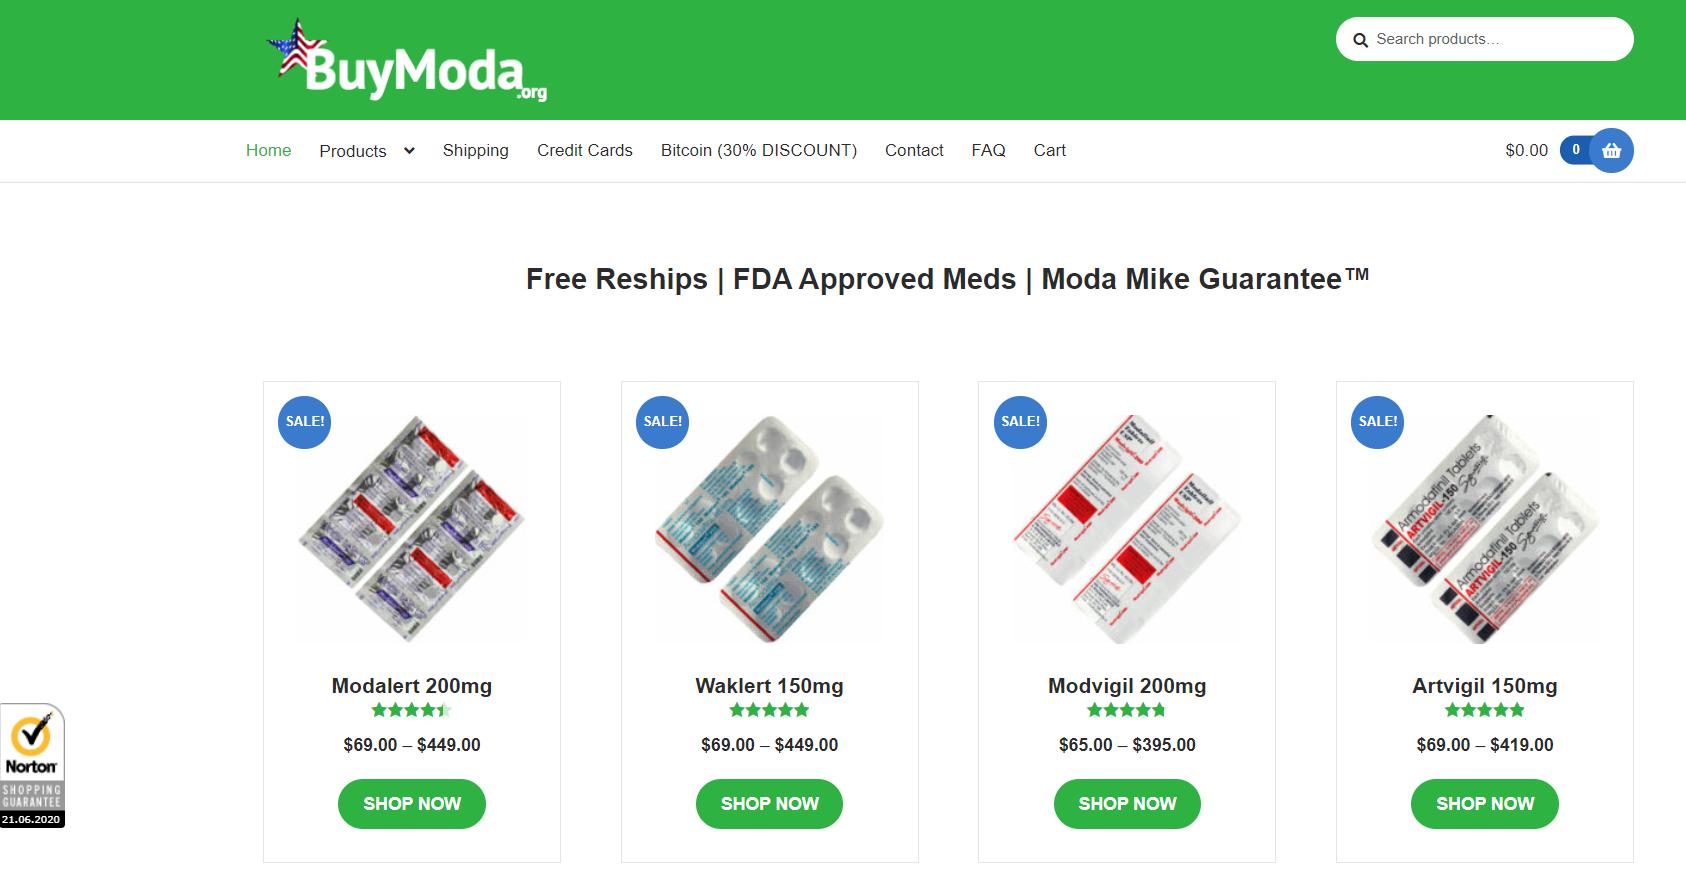 BuyModa Online Pharmacy